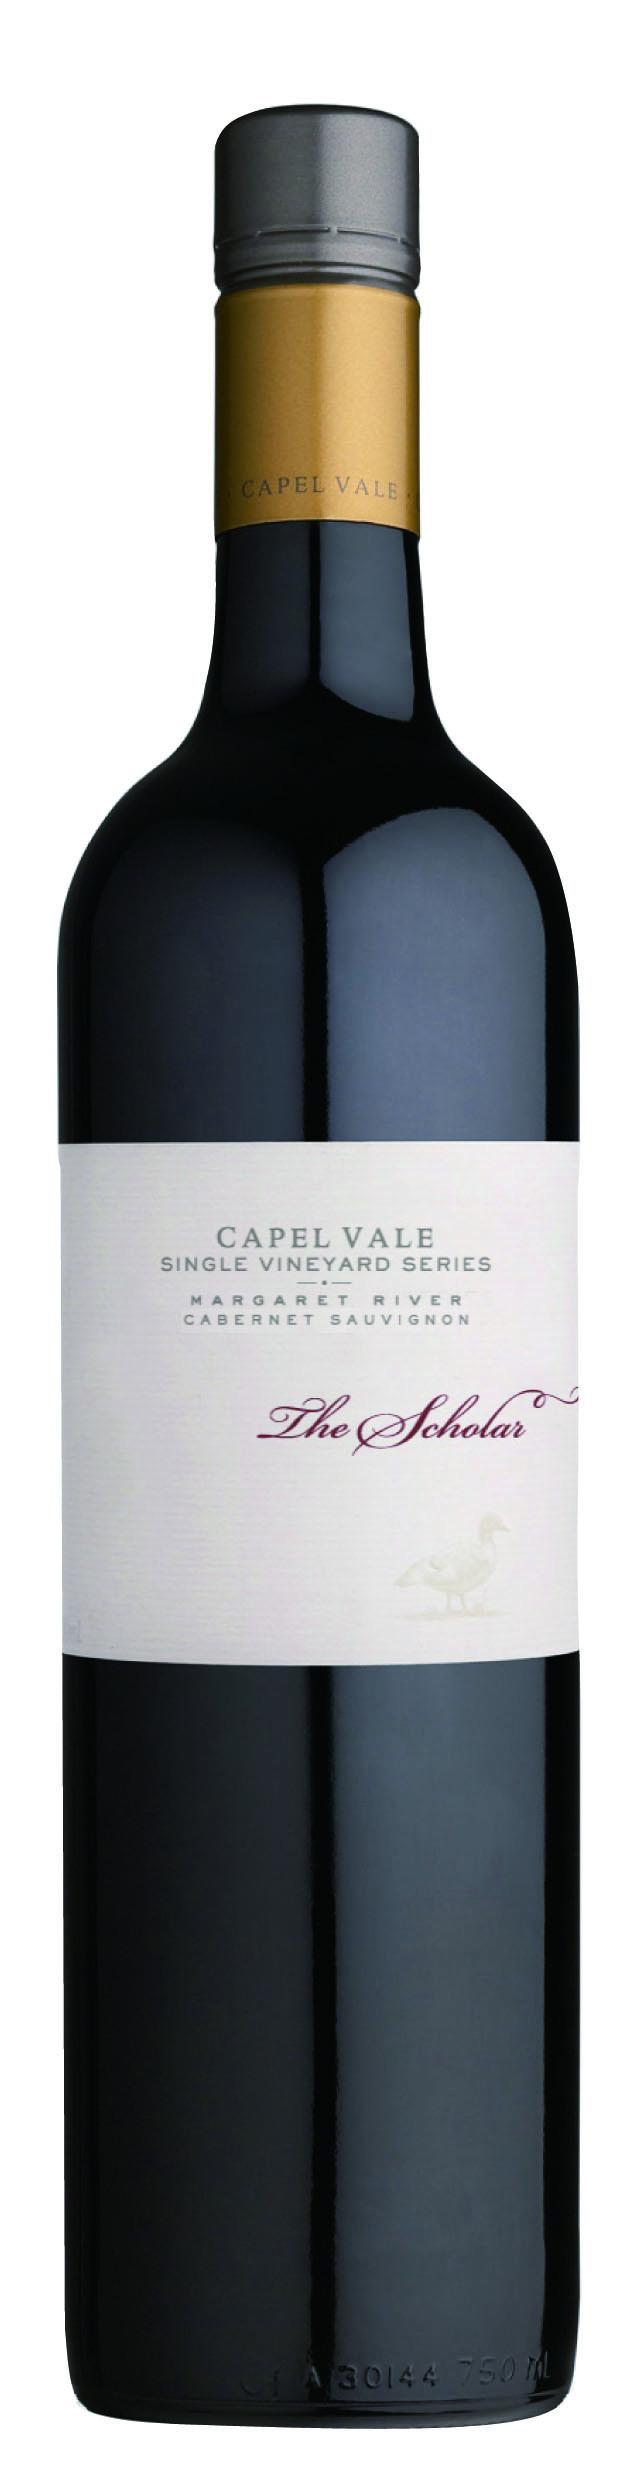 Capel vale the scholar cabernet sauvignon.jpg